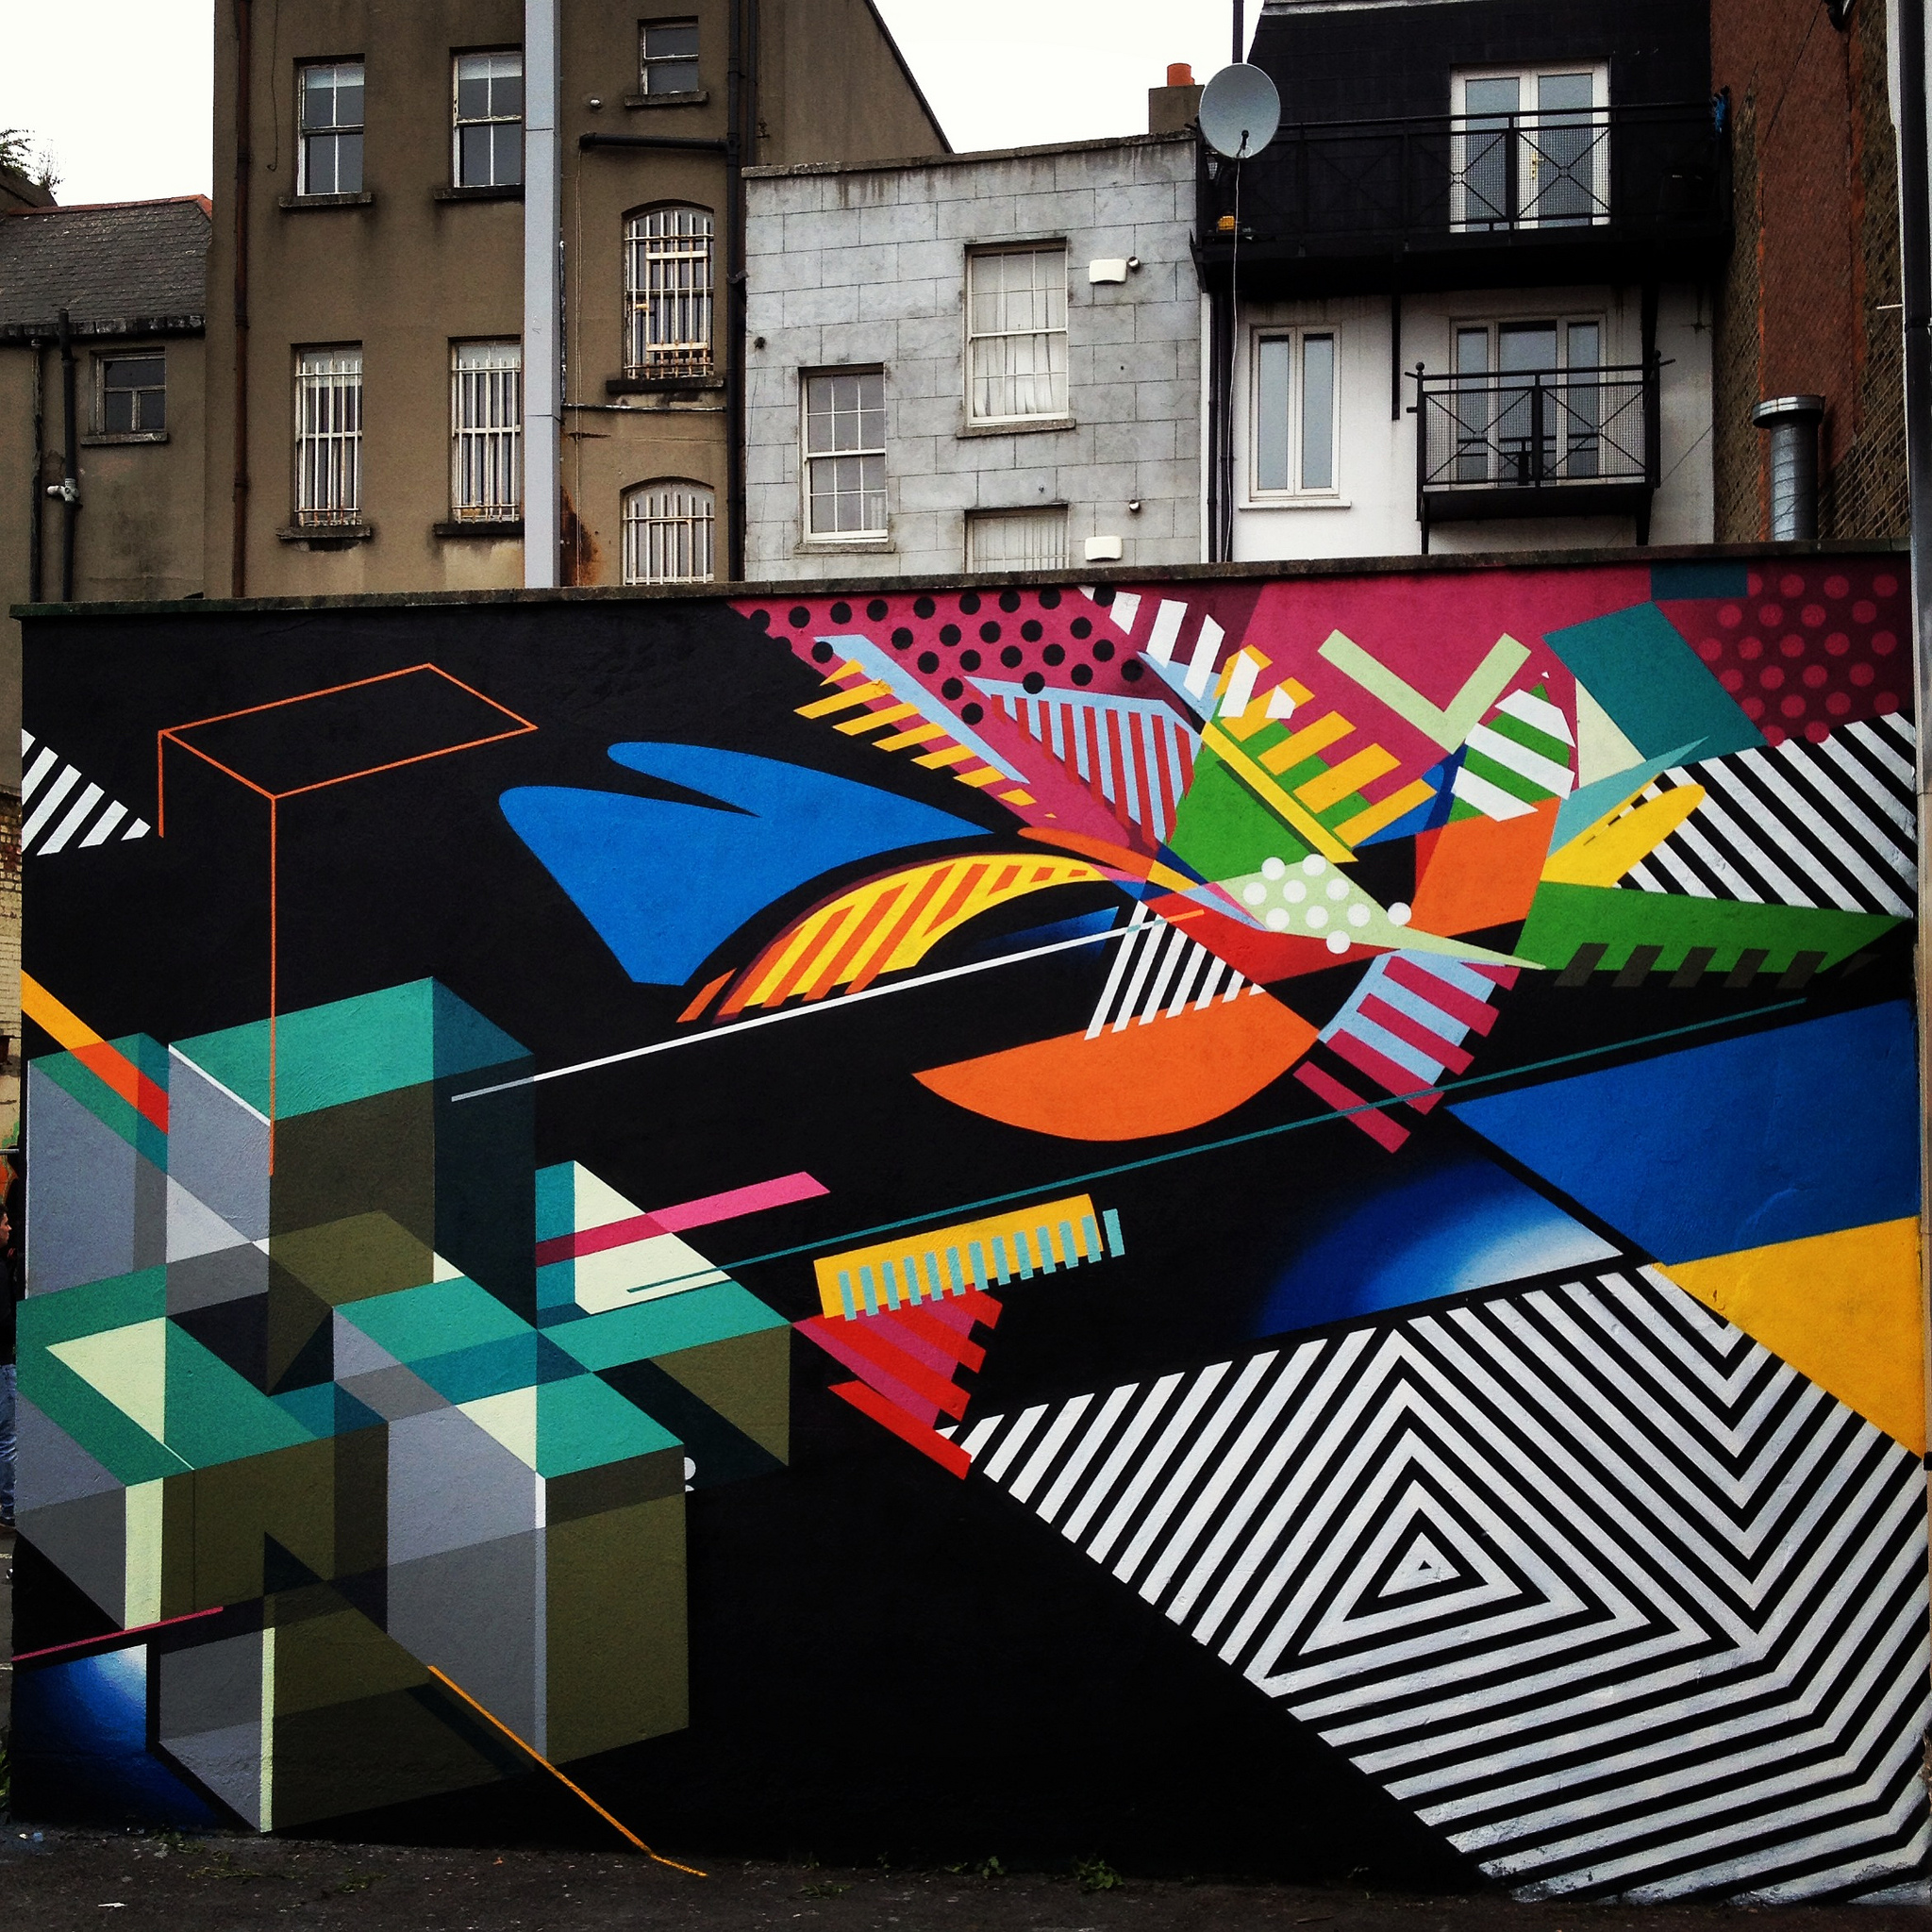 Street graffiti artwork by Sektwo and Maser Loves You, 2013.